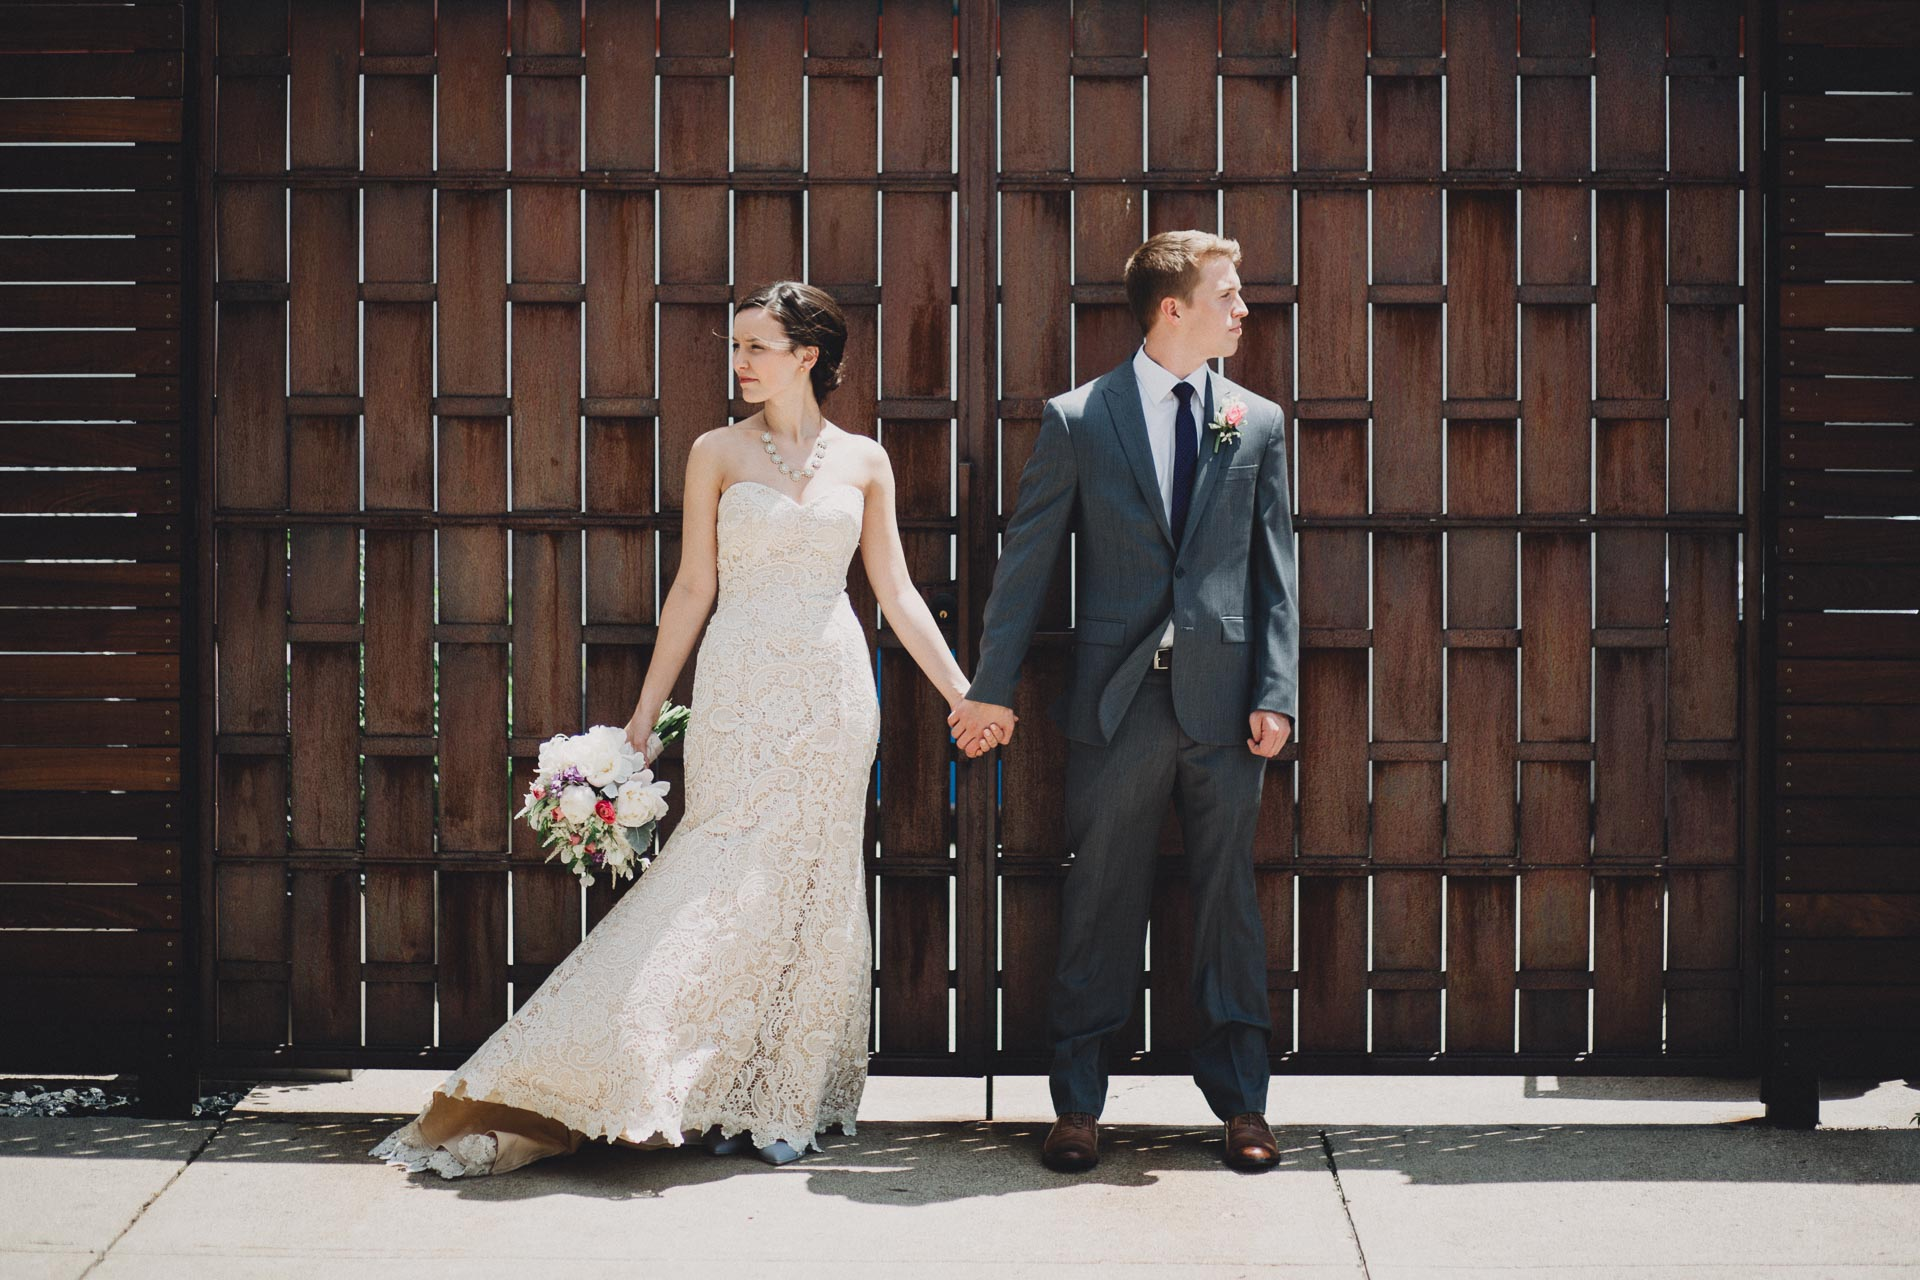 Julia-Michael-Cincinnati-Music-Hall-Wedding-068@2x.jpg